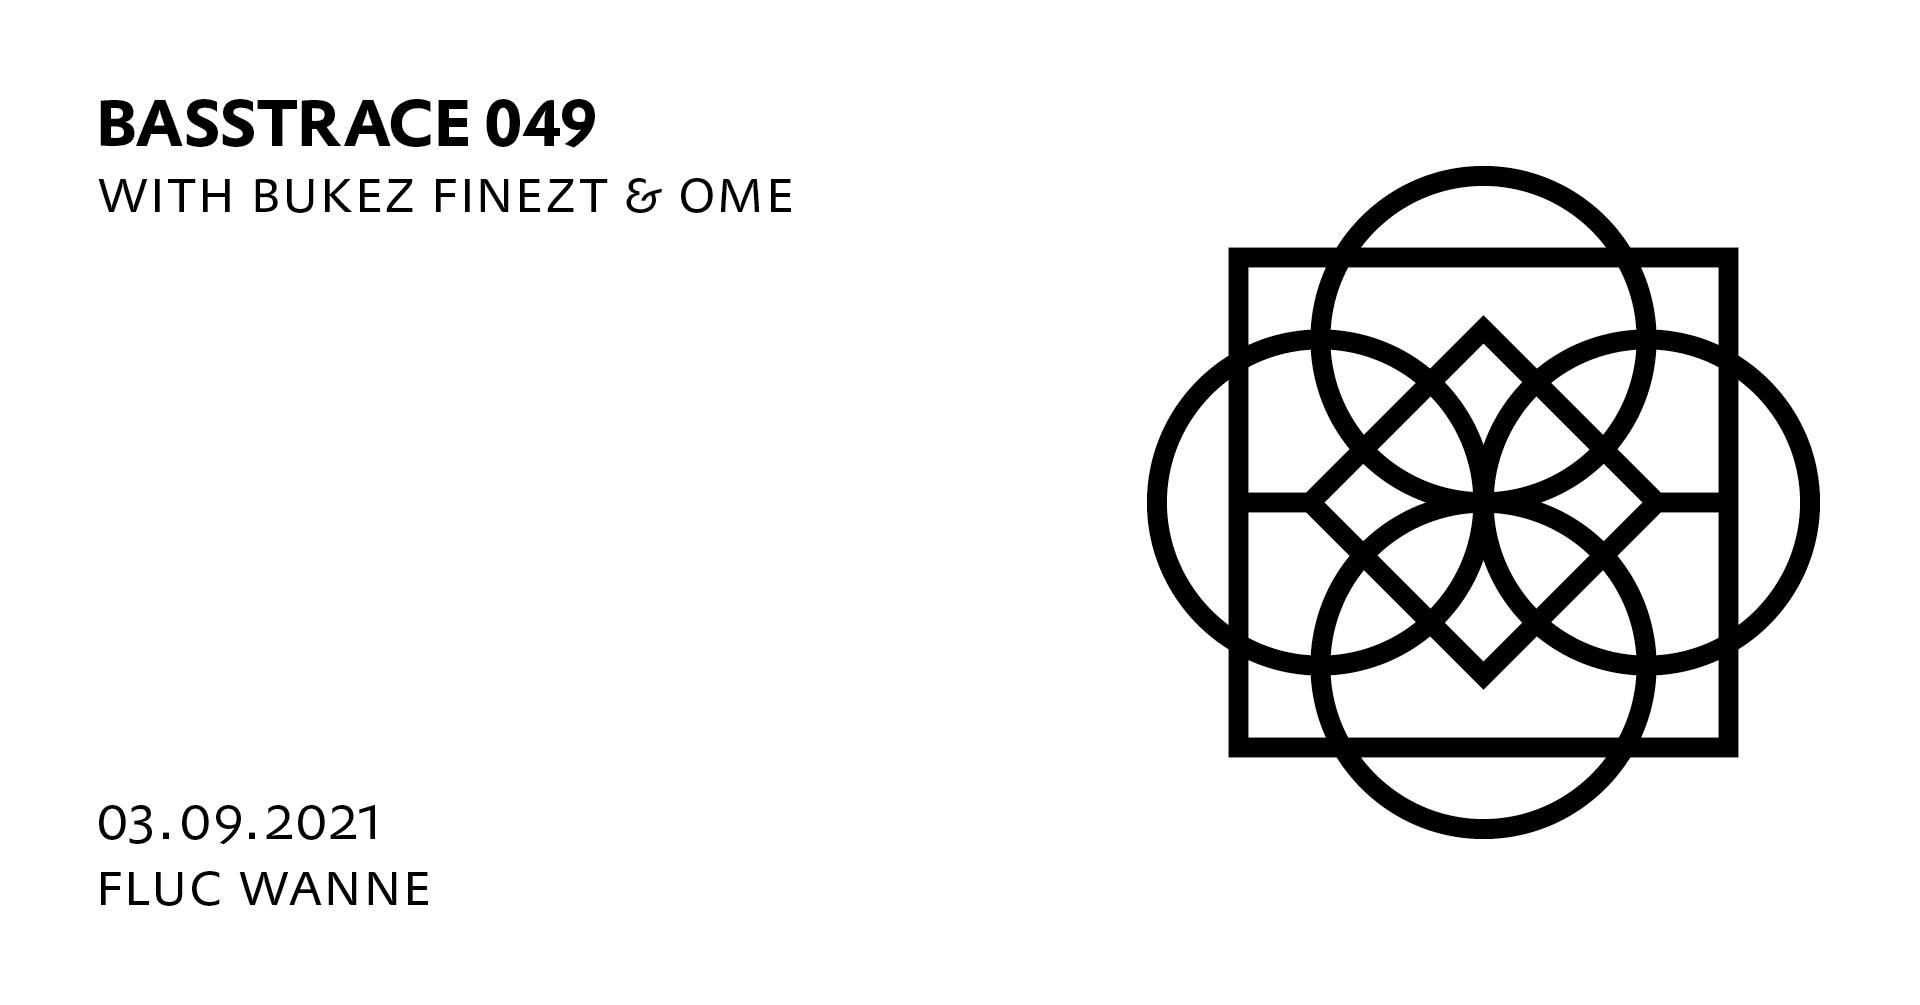 Events Wien: BASSTRACE 049 with BUKEZ FINEZT & OME